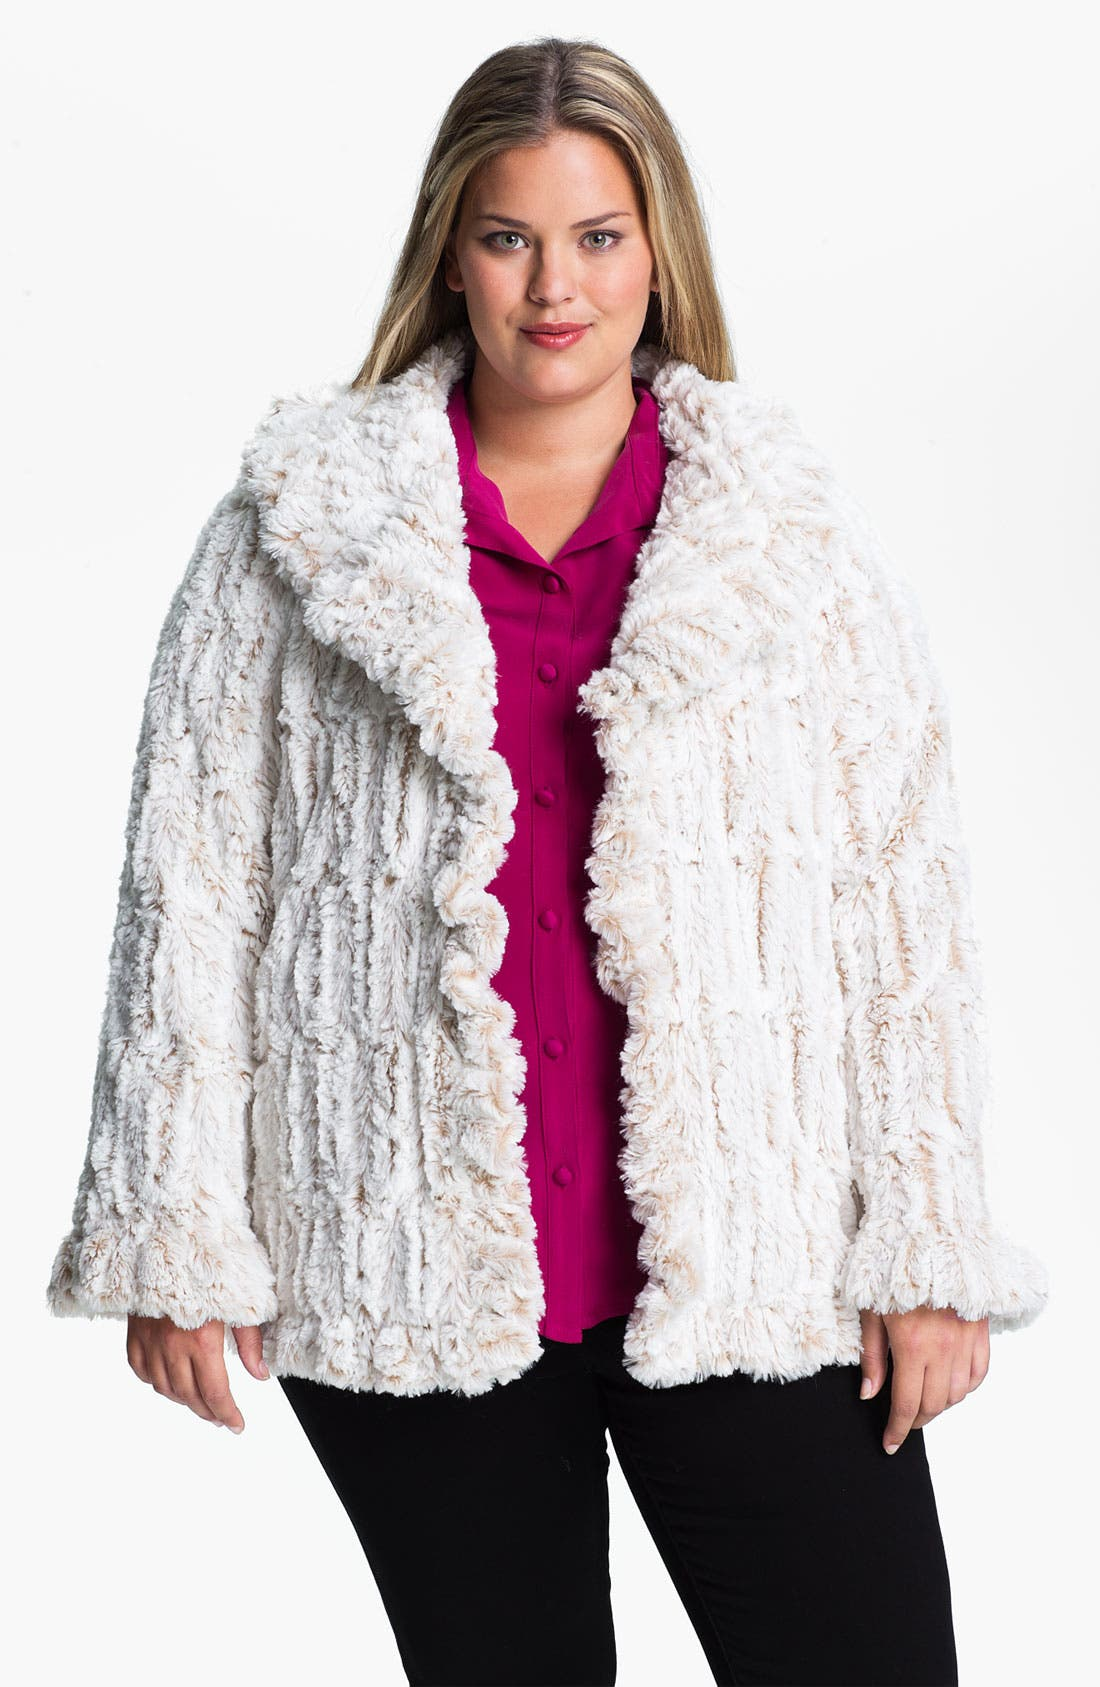 Alternate Image 1 Selected - Damselle Ruffled Faux Fur Jacket (Plus)